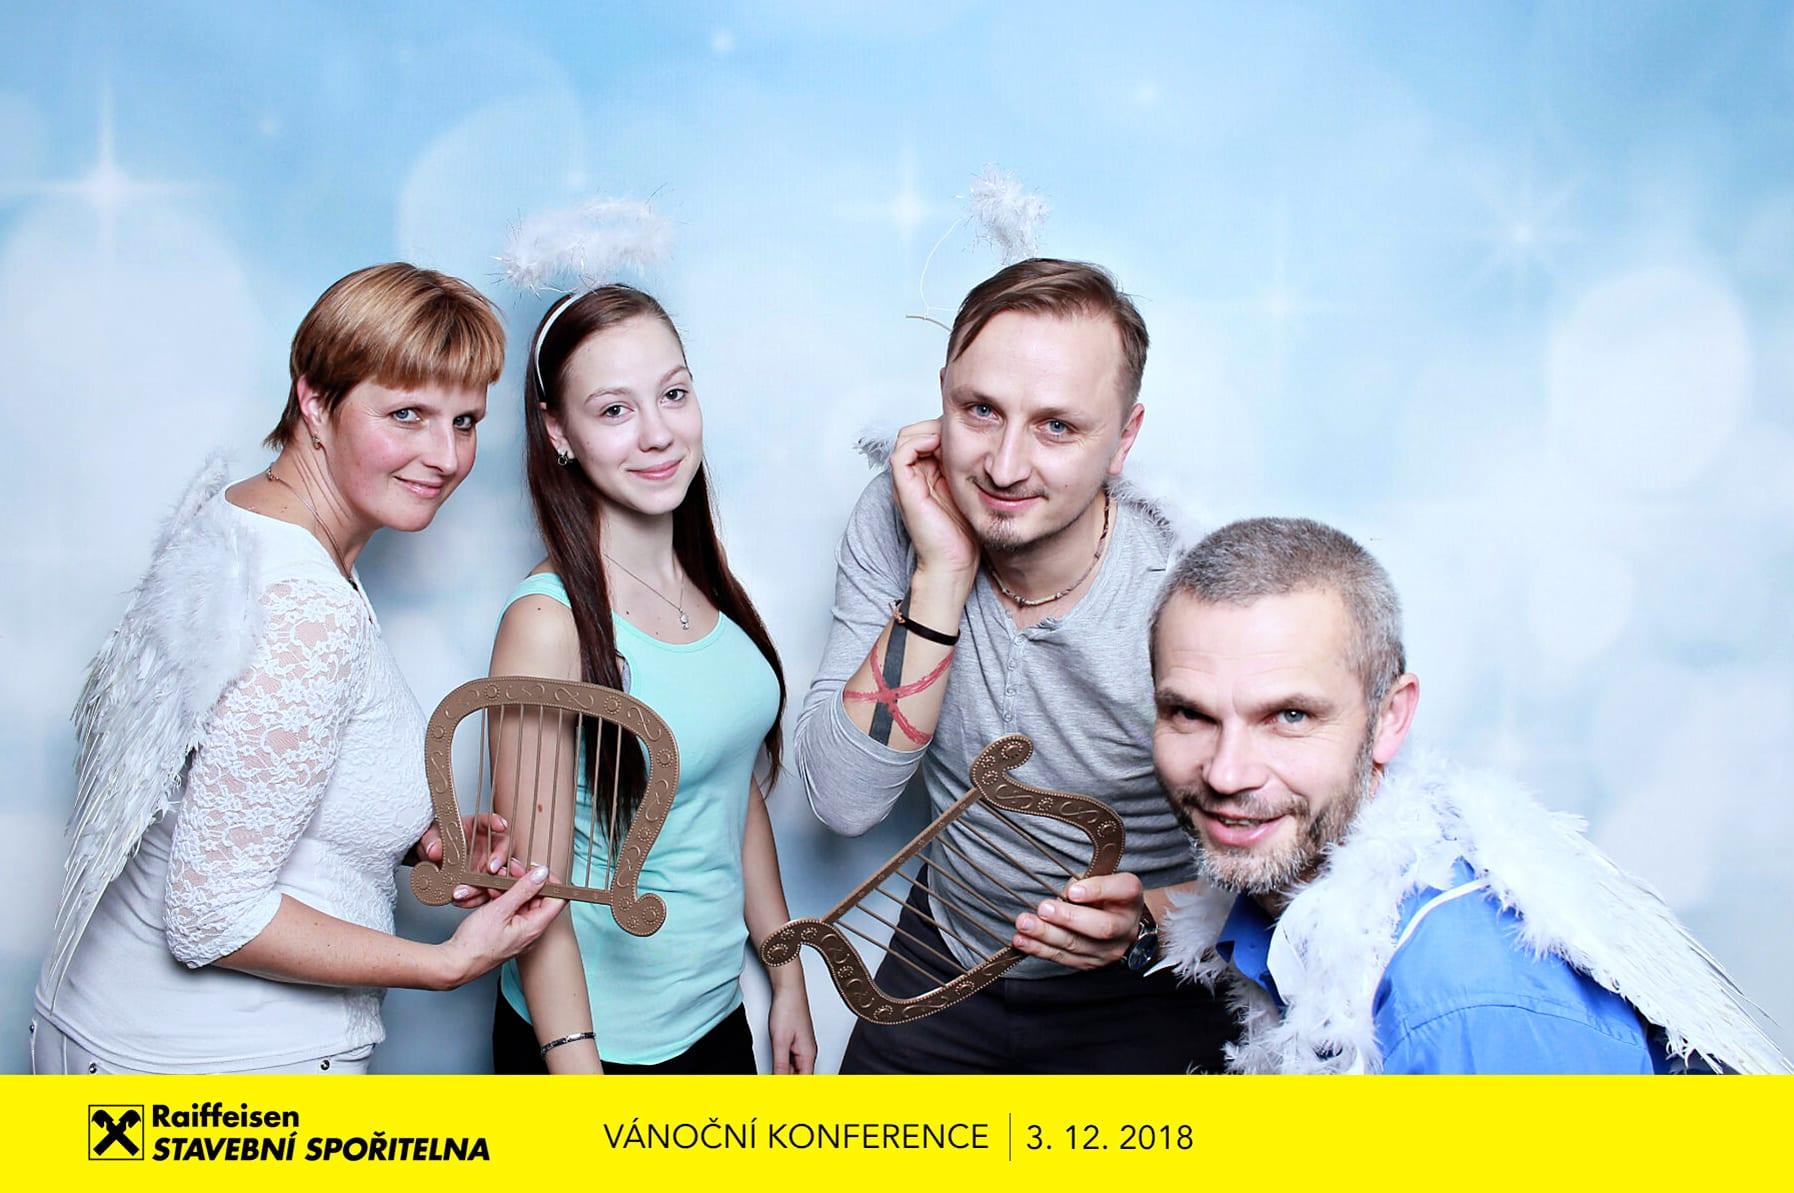 fotokoutek-raiffeisen-3-12-2018-531740